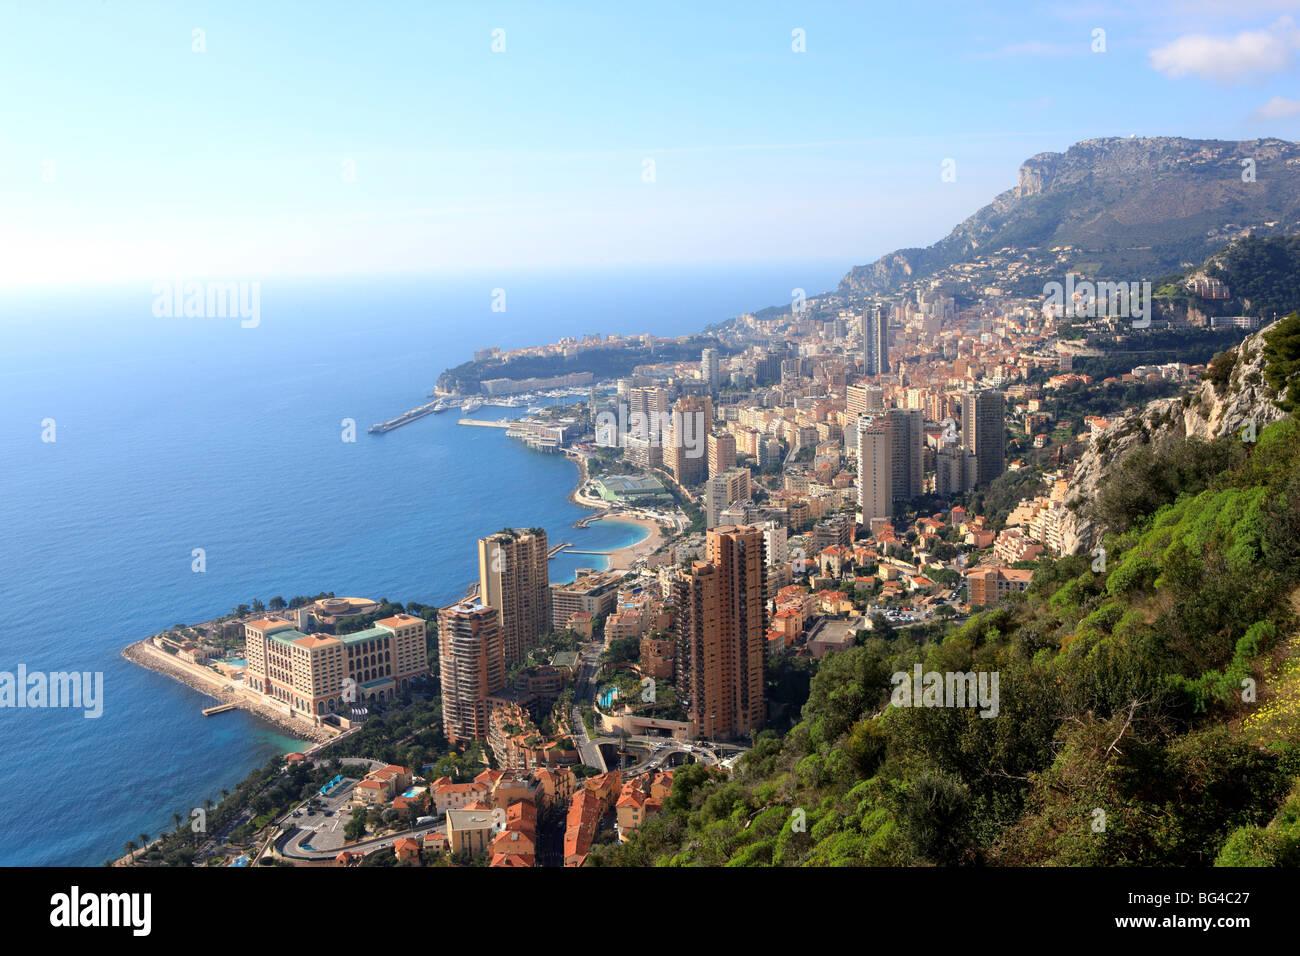 Elevated view over the city, Monte Carlo, Monaco, Cote d'Azur, Mediterranean, Europe - Stock Image